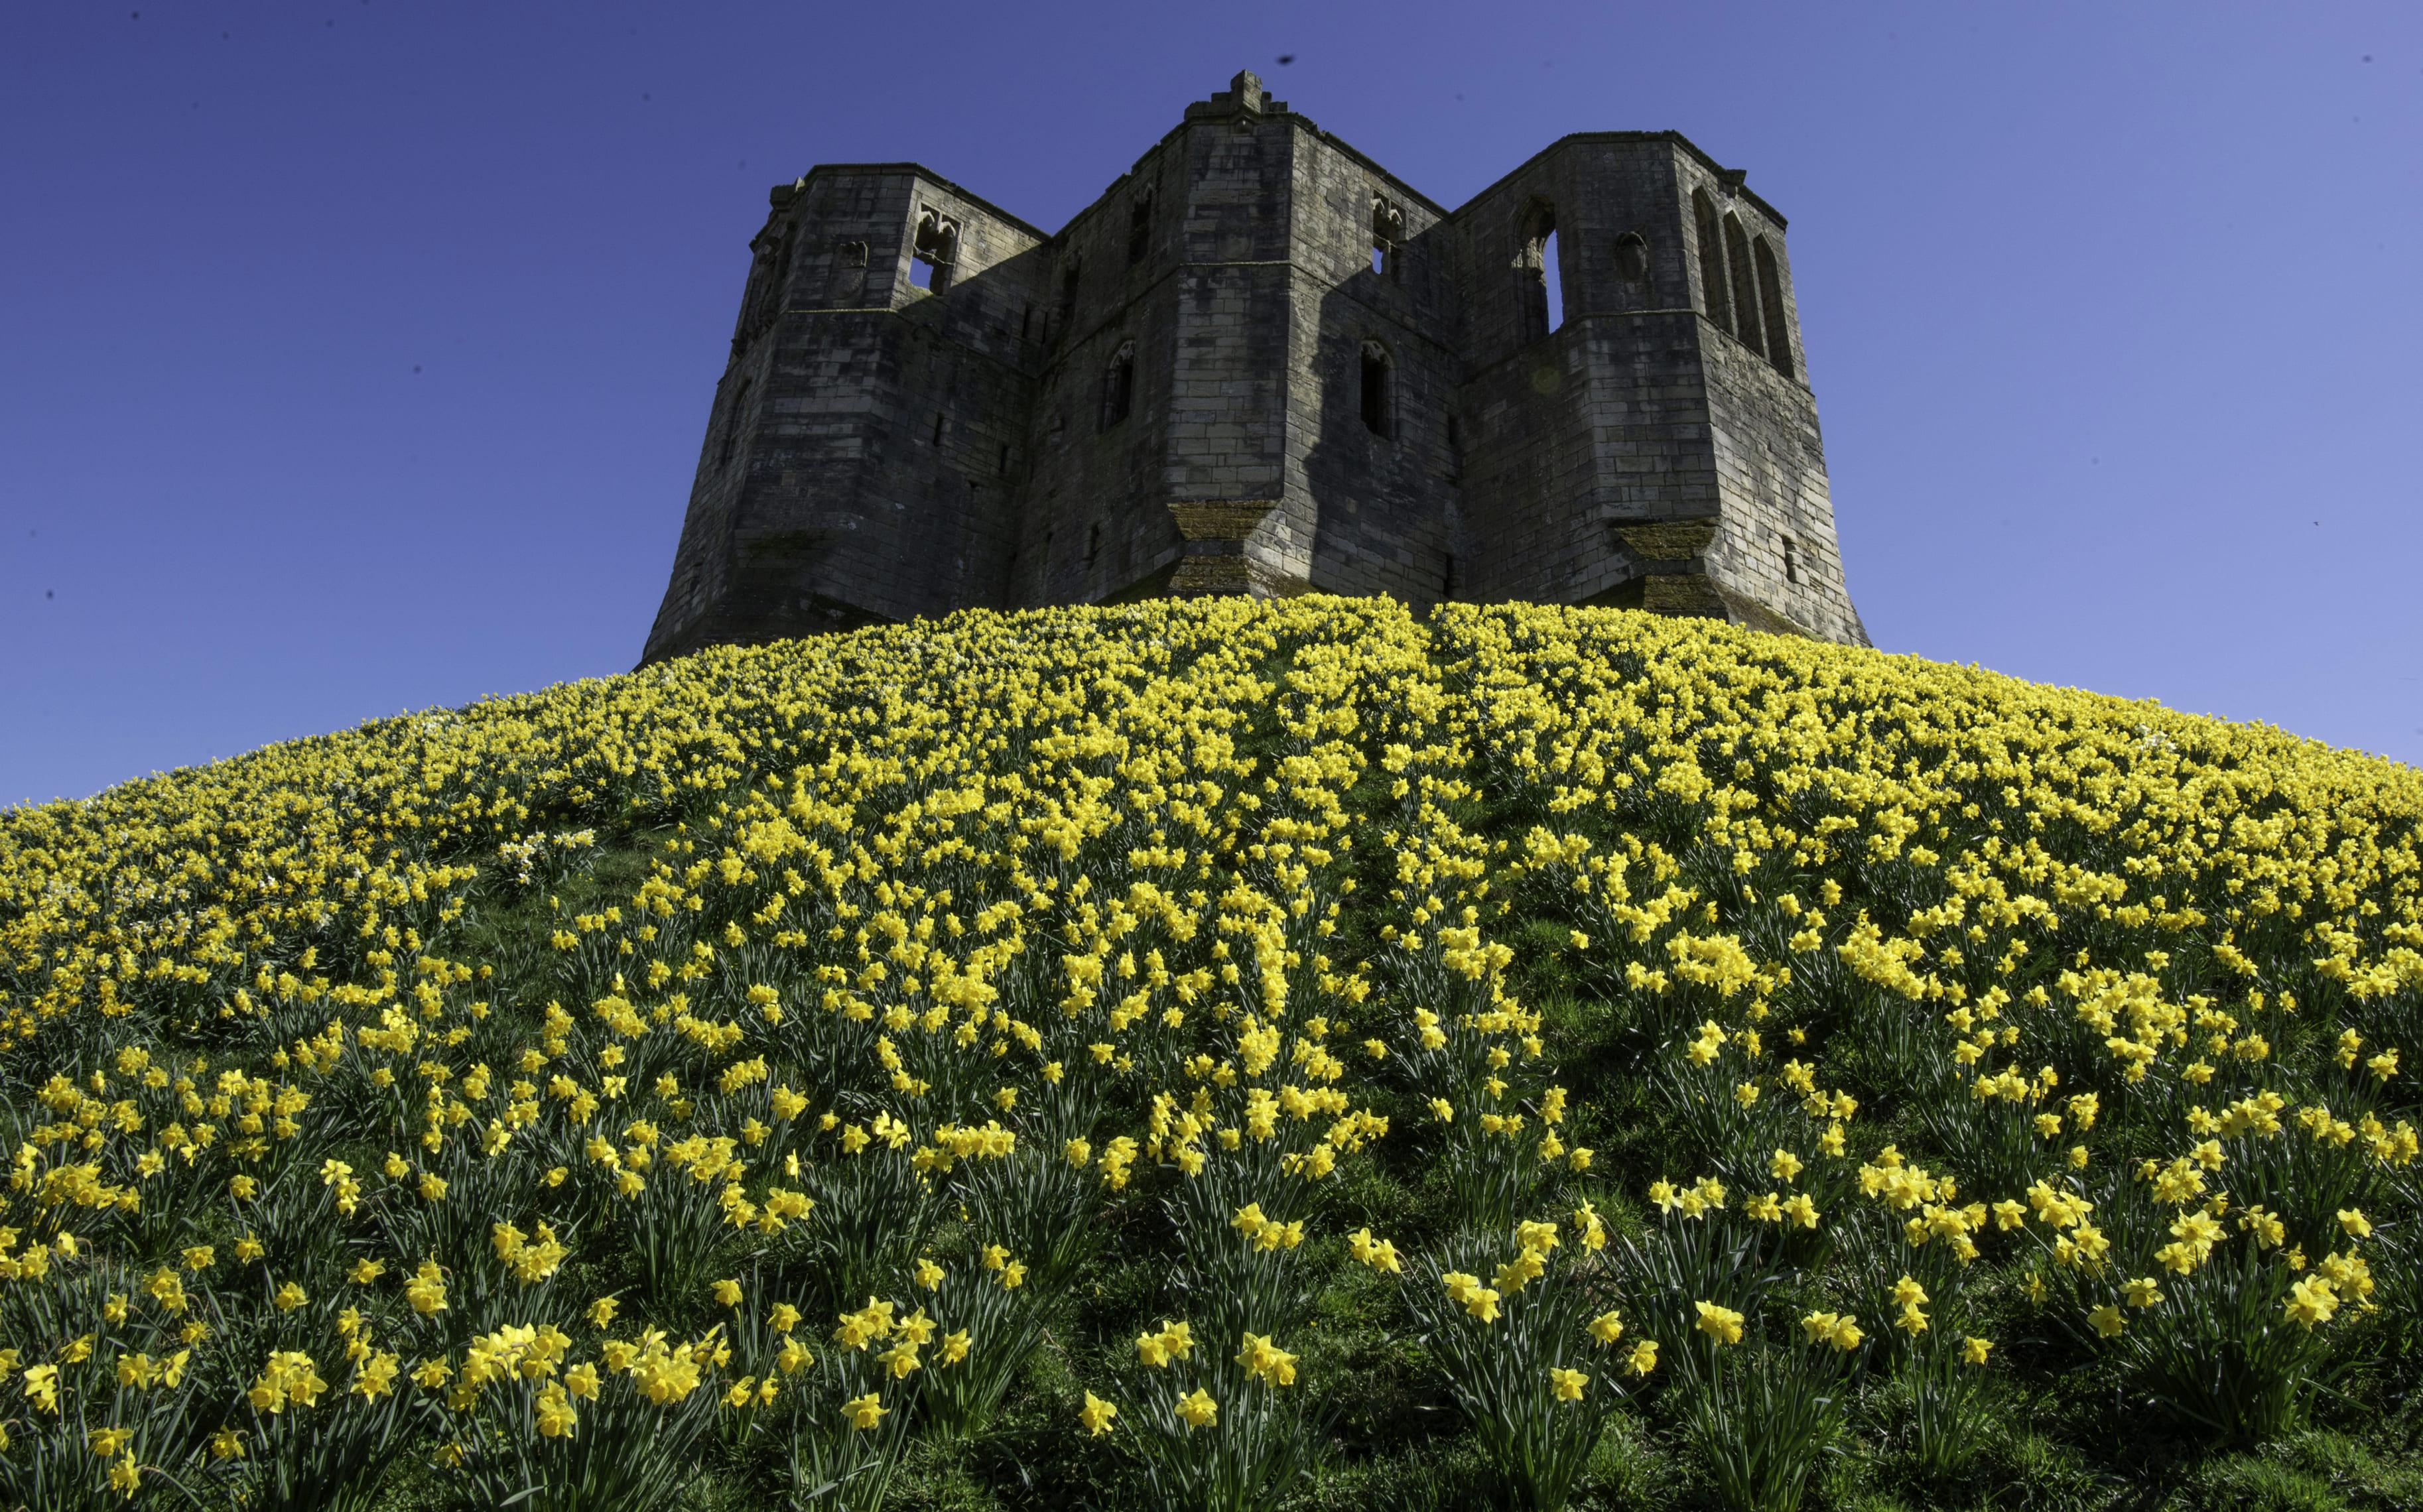 daffodils-photo-82